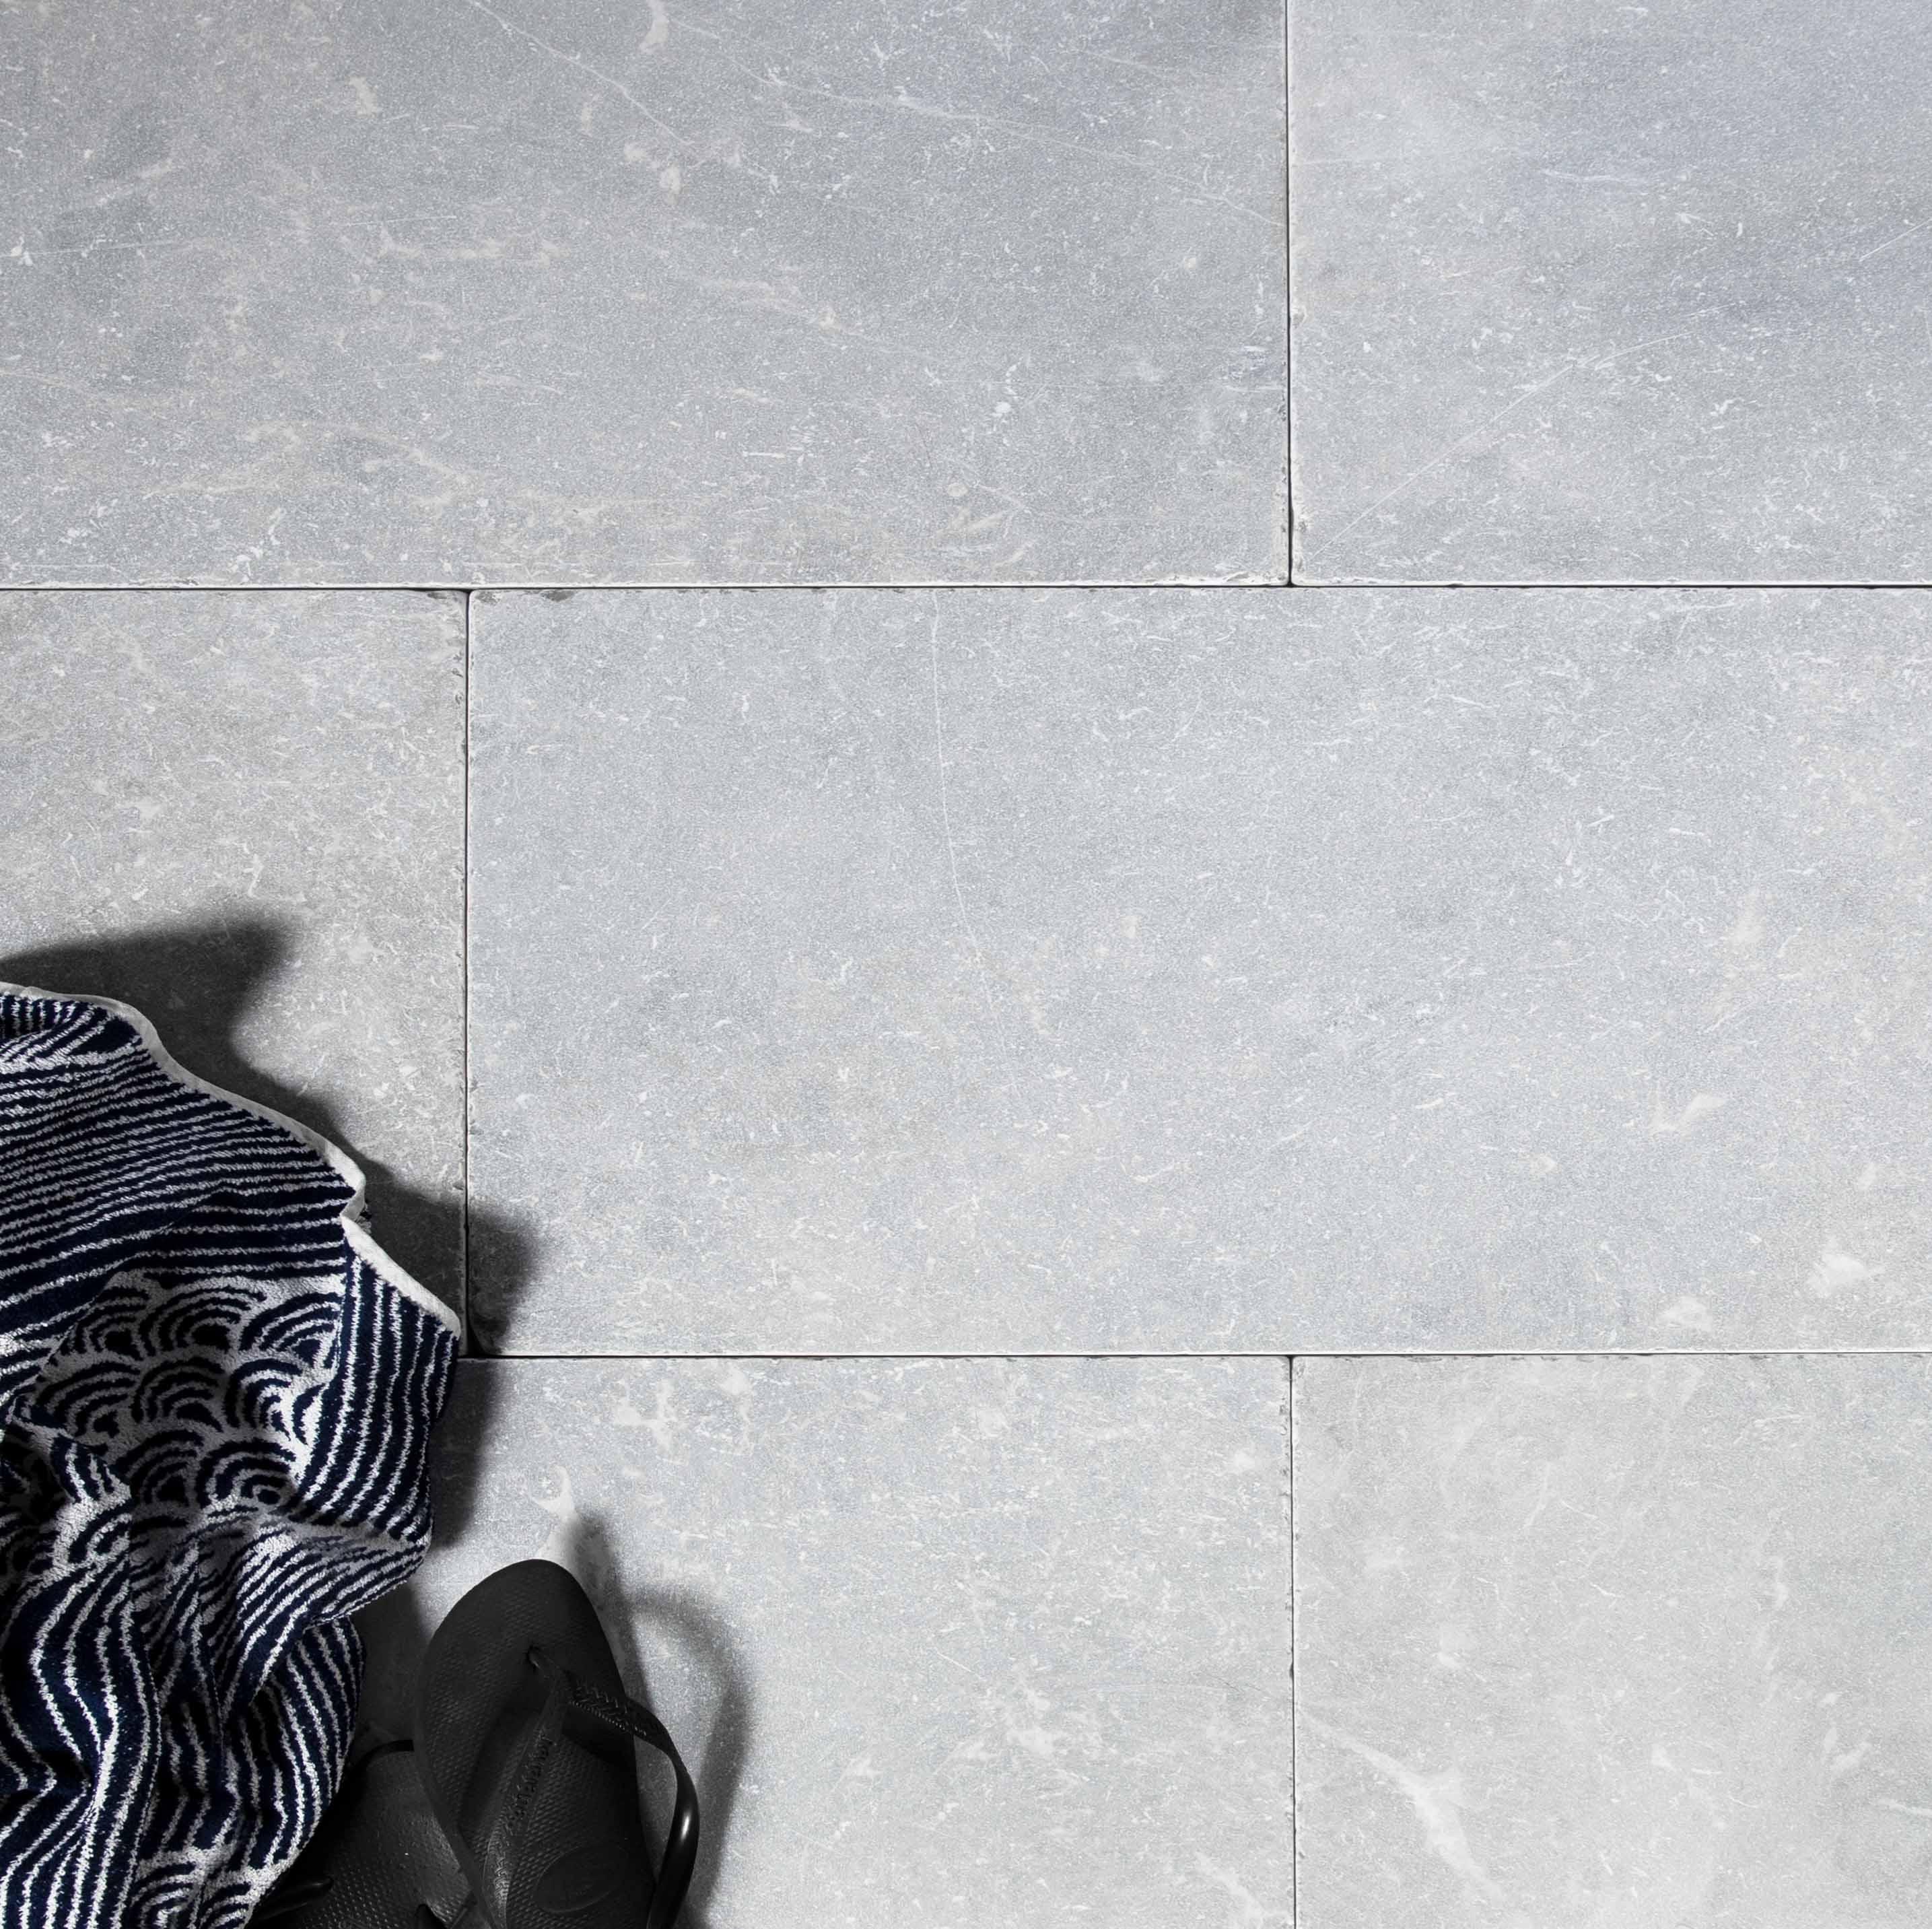 Stone-Pavers-and-Tiles-Outdoor Hero Harmaa2